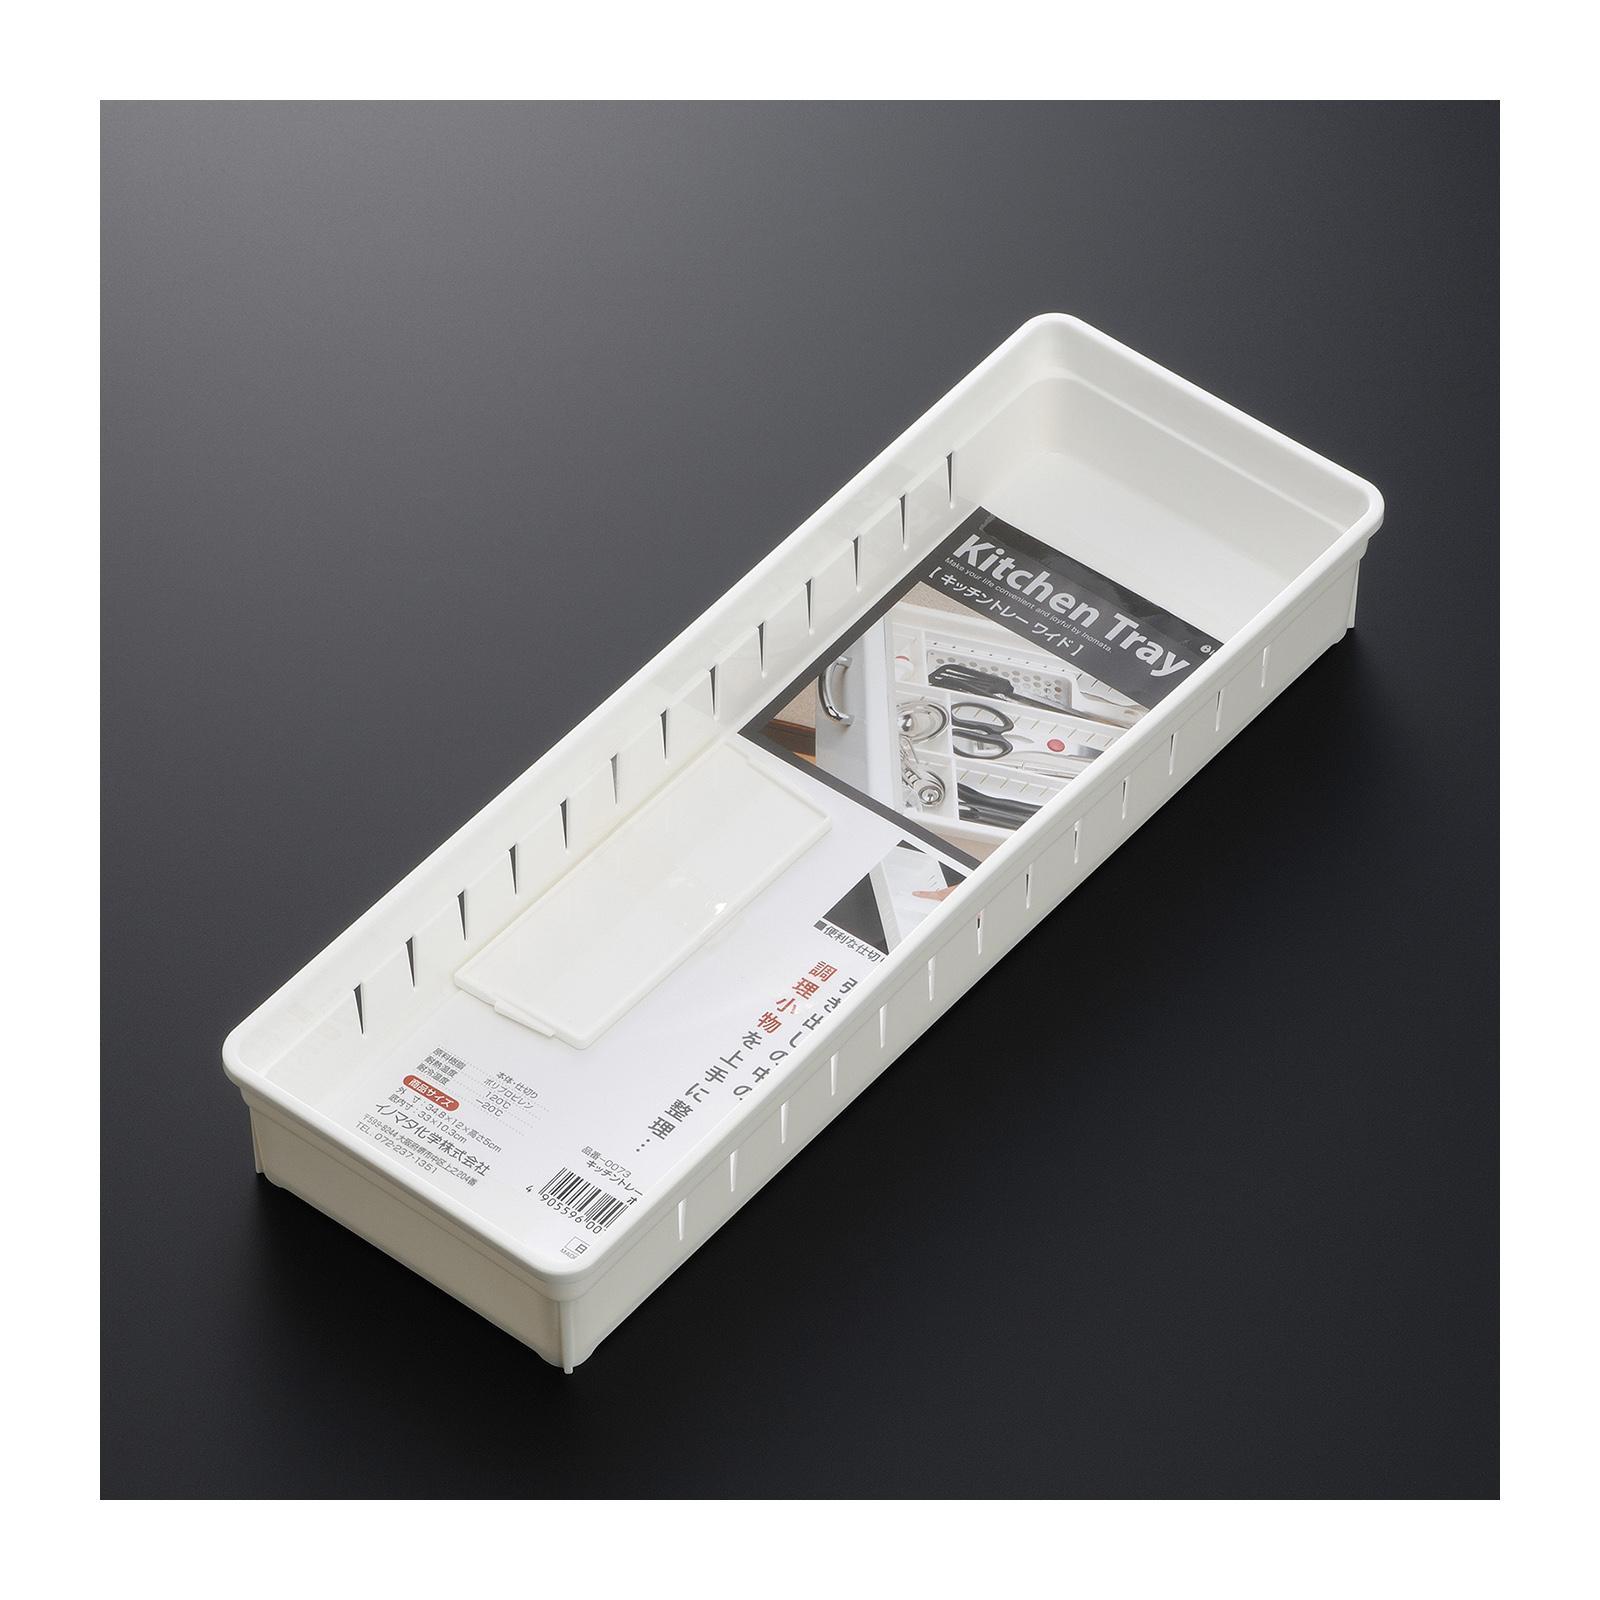 Inomata Kitchen Tray with Divider (White)